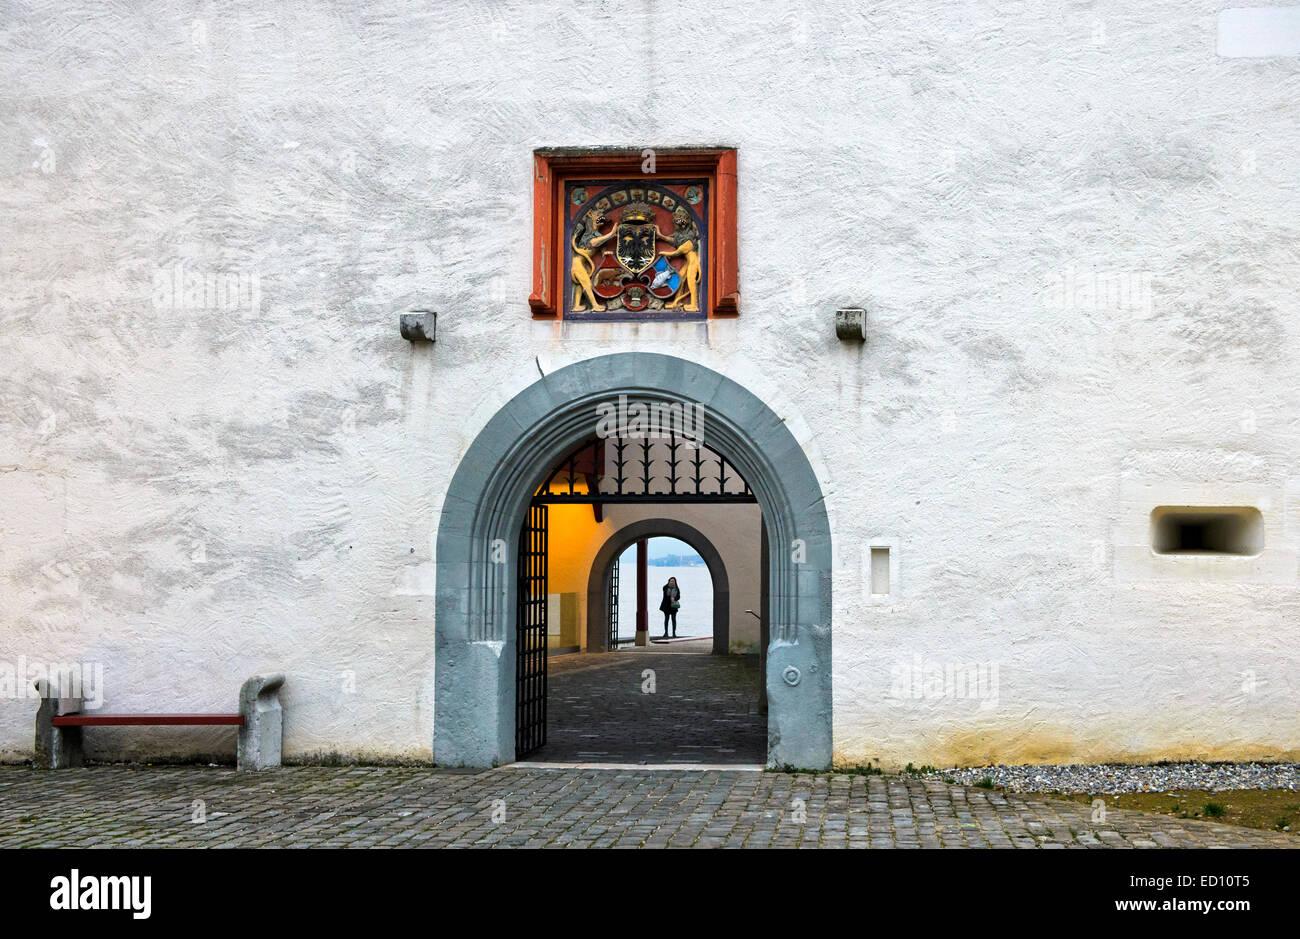 Portal of the Nyon castle, Château de Nyon, Nyon, Vaud, Switzerland - Stock Image